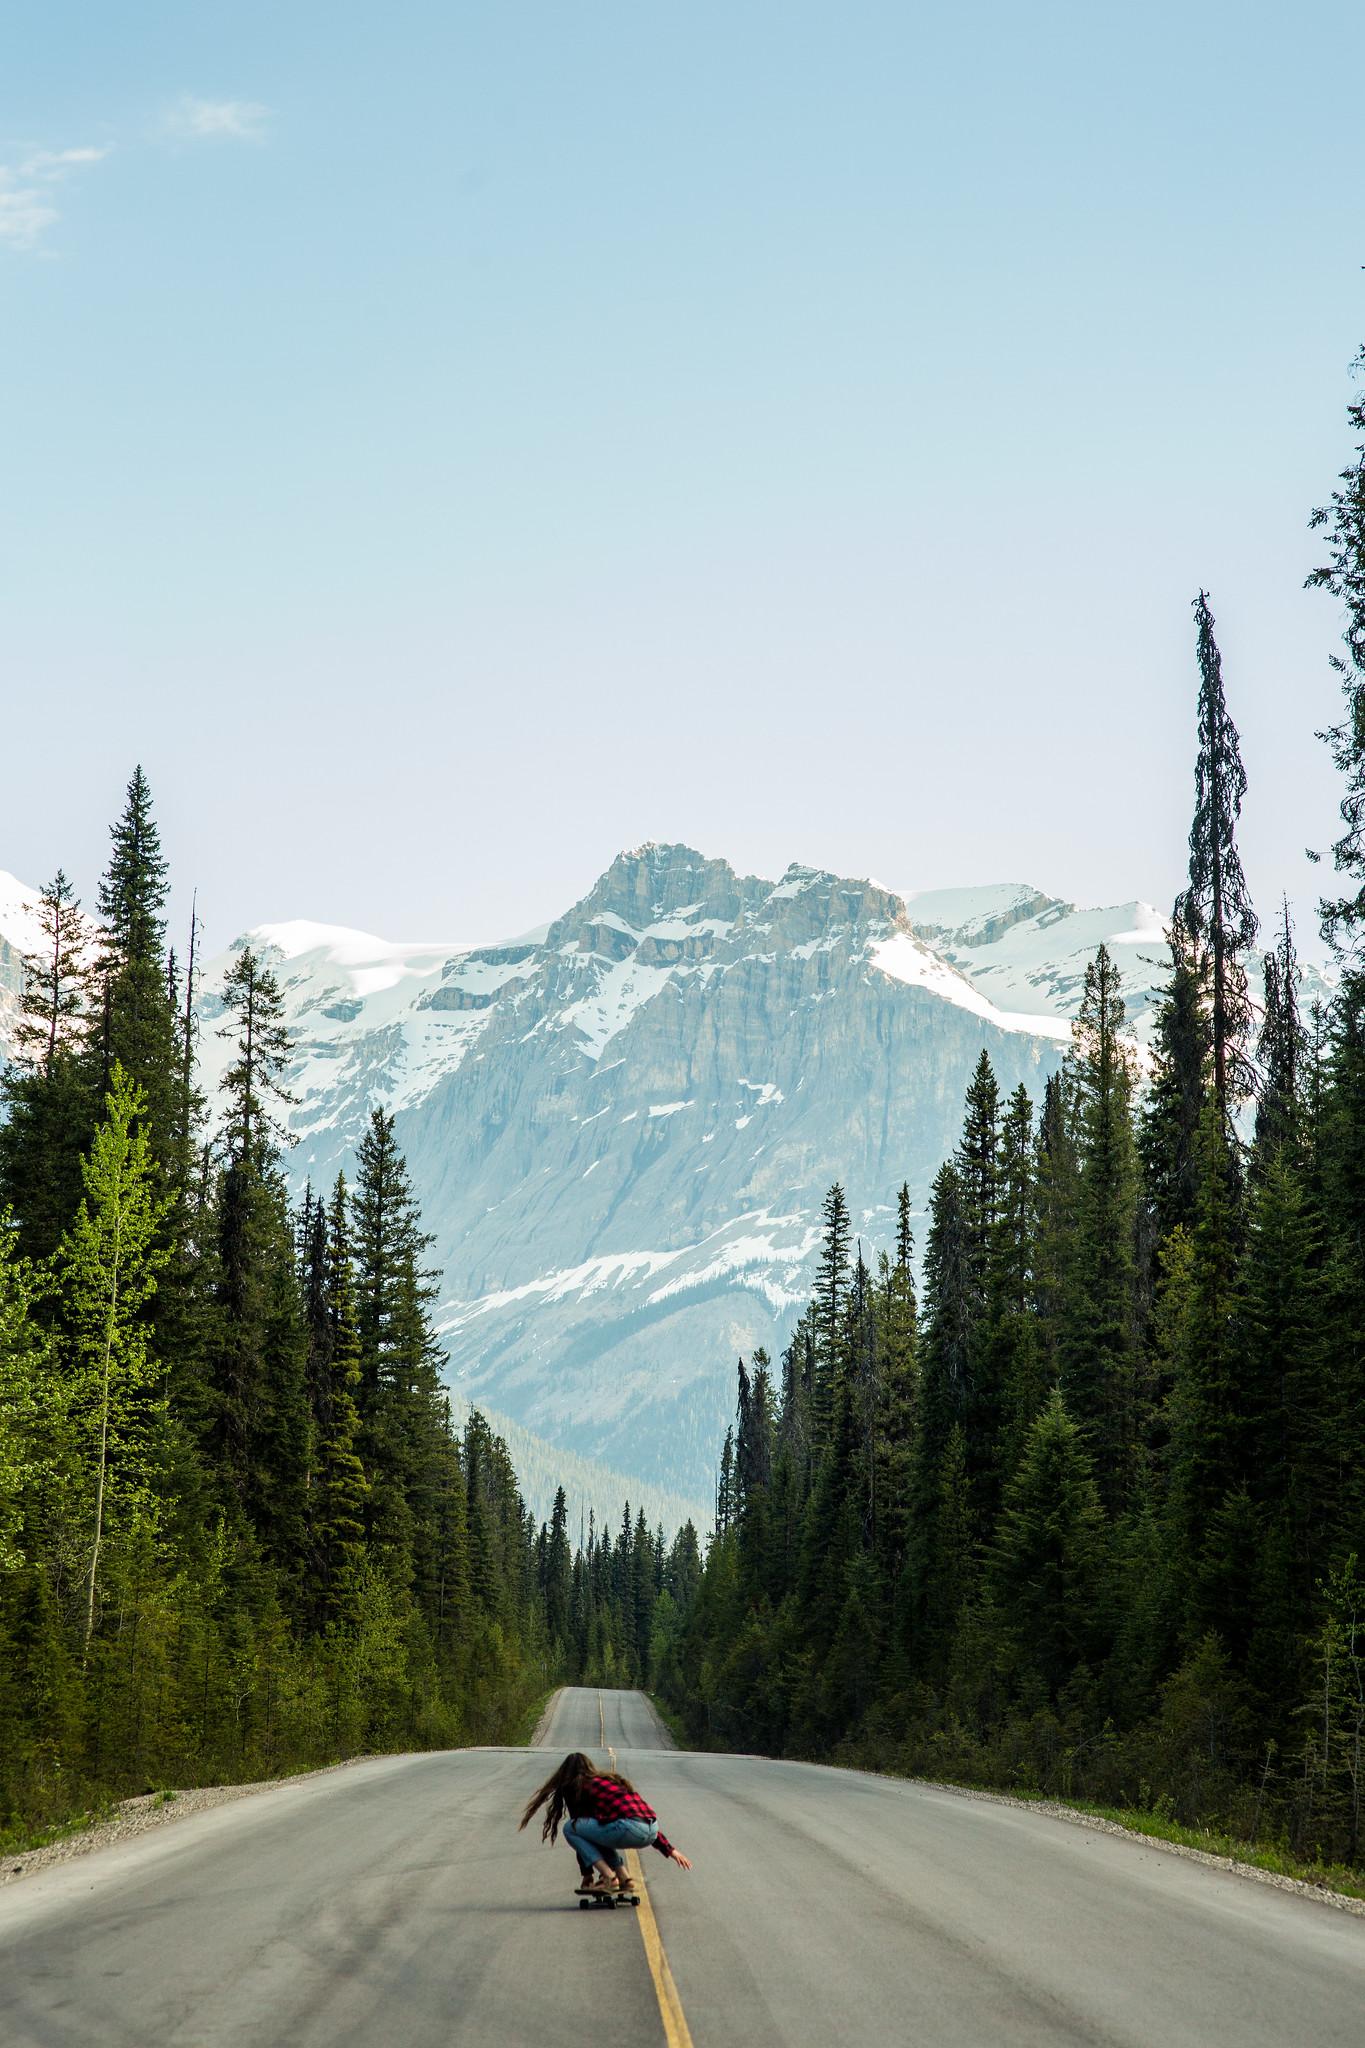 Banff690-X4.jpg